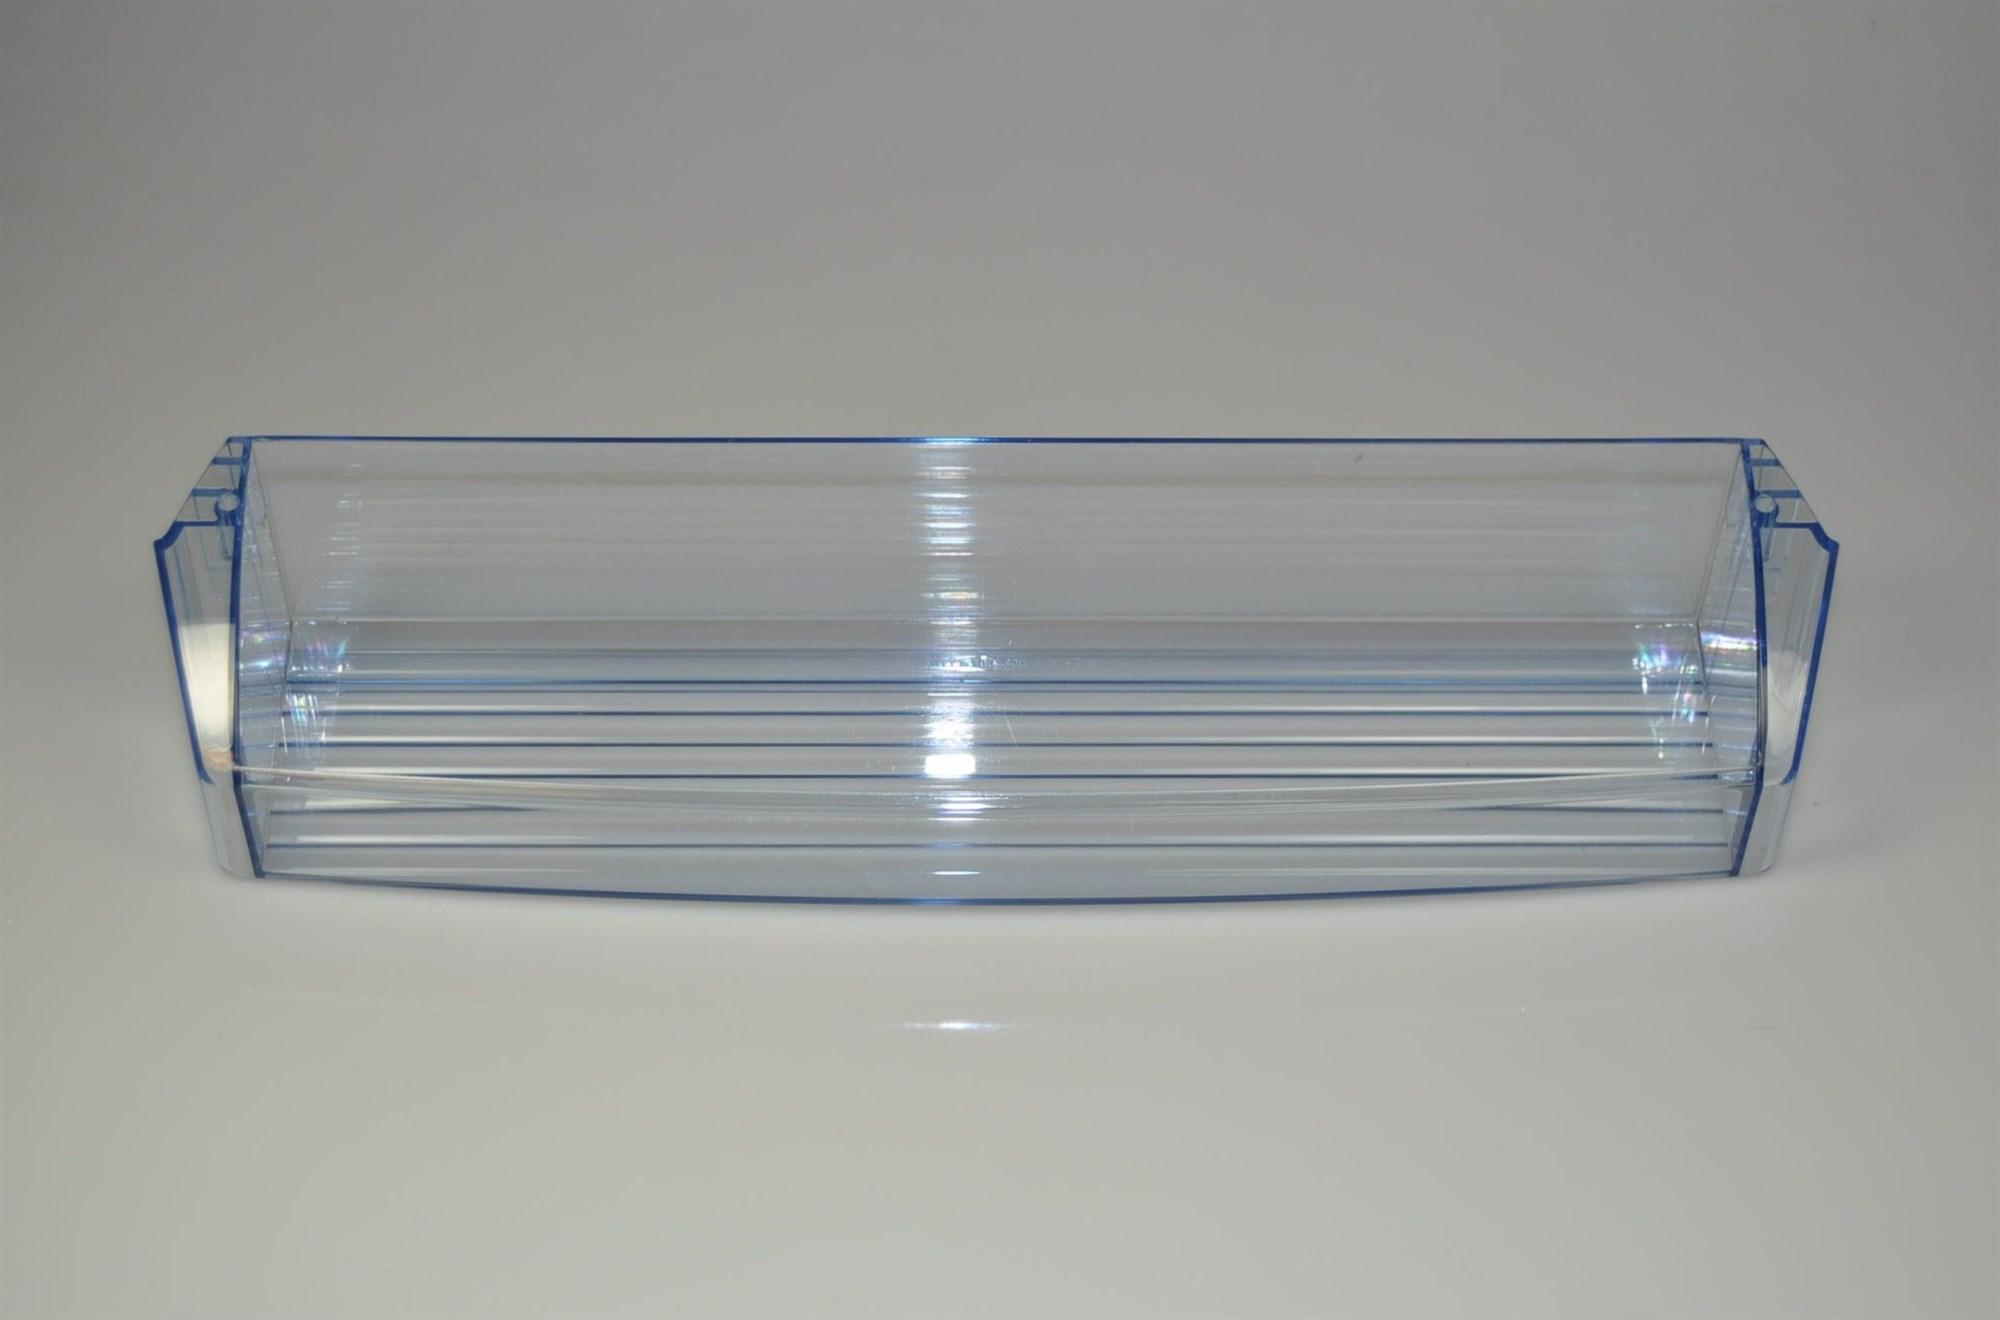 Door Shelf Aeg Fridge Amp Freezer 80 Mm X 440 Mm X 103 Mm